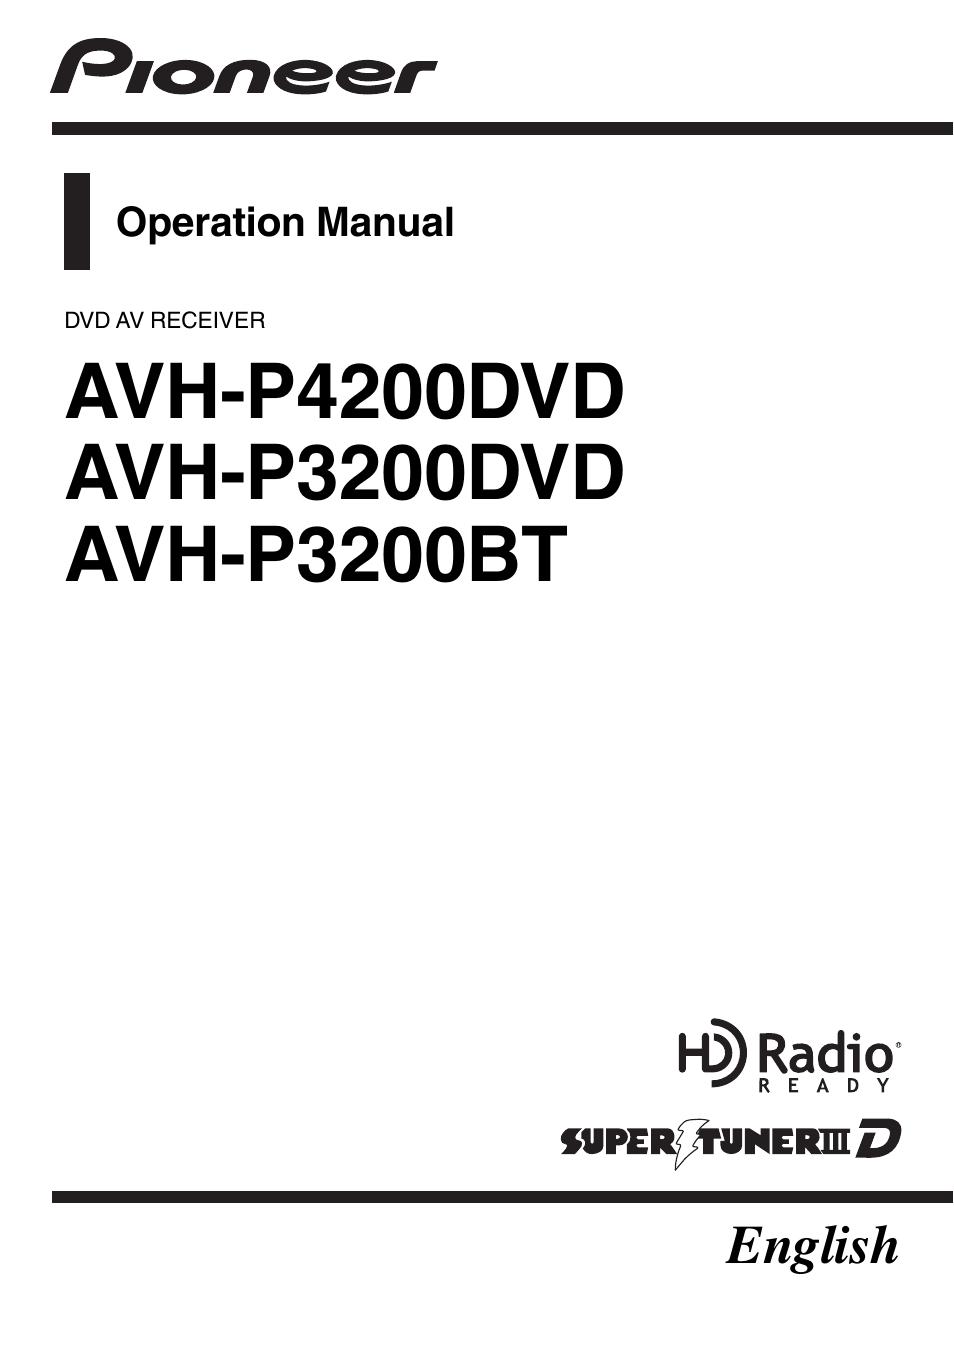 Scosche Stereo Wiring Diagrams For 2004 Chevy Aveo. Scosche Wiring ...